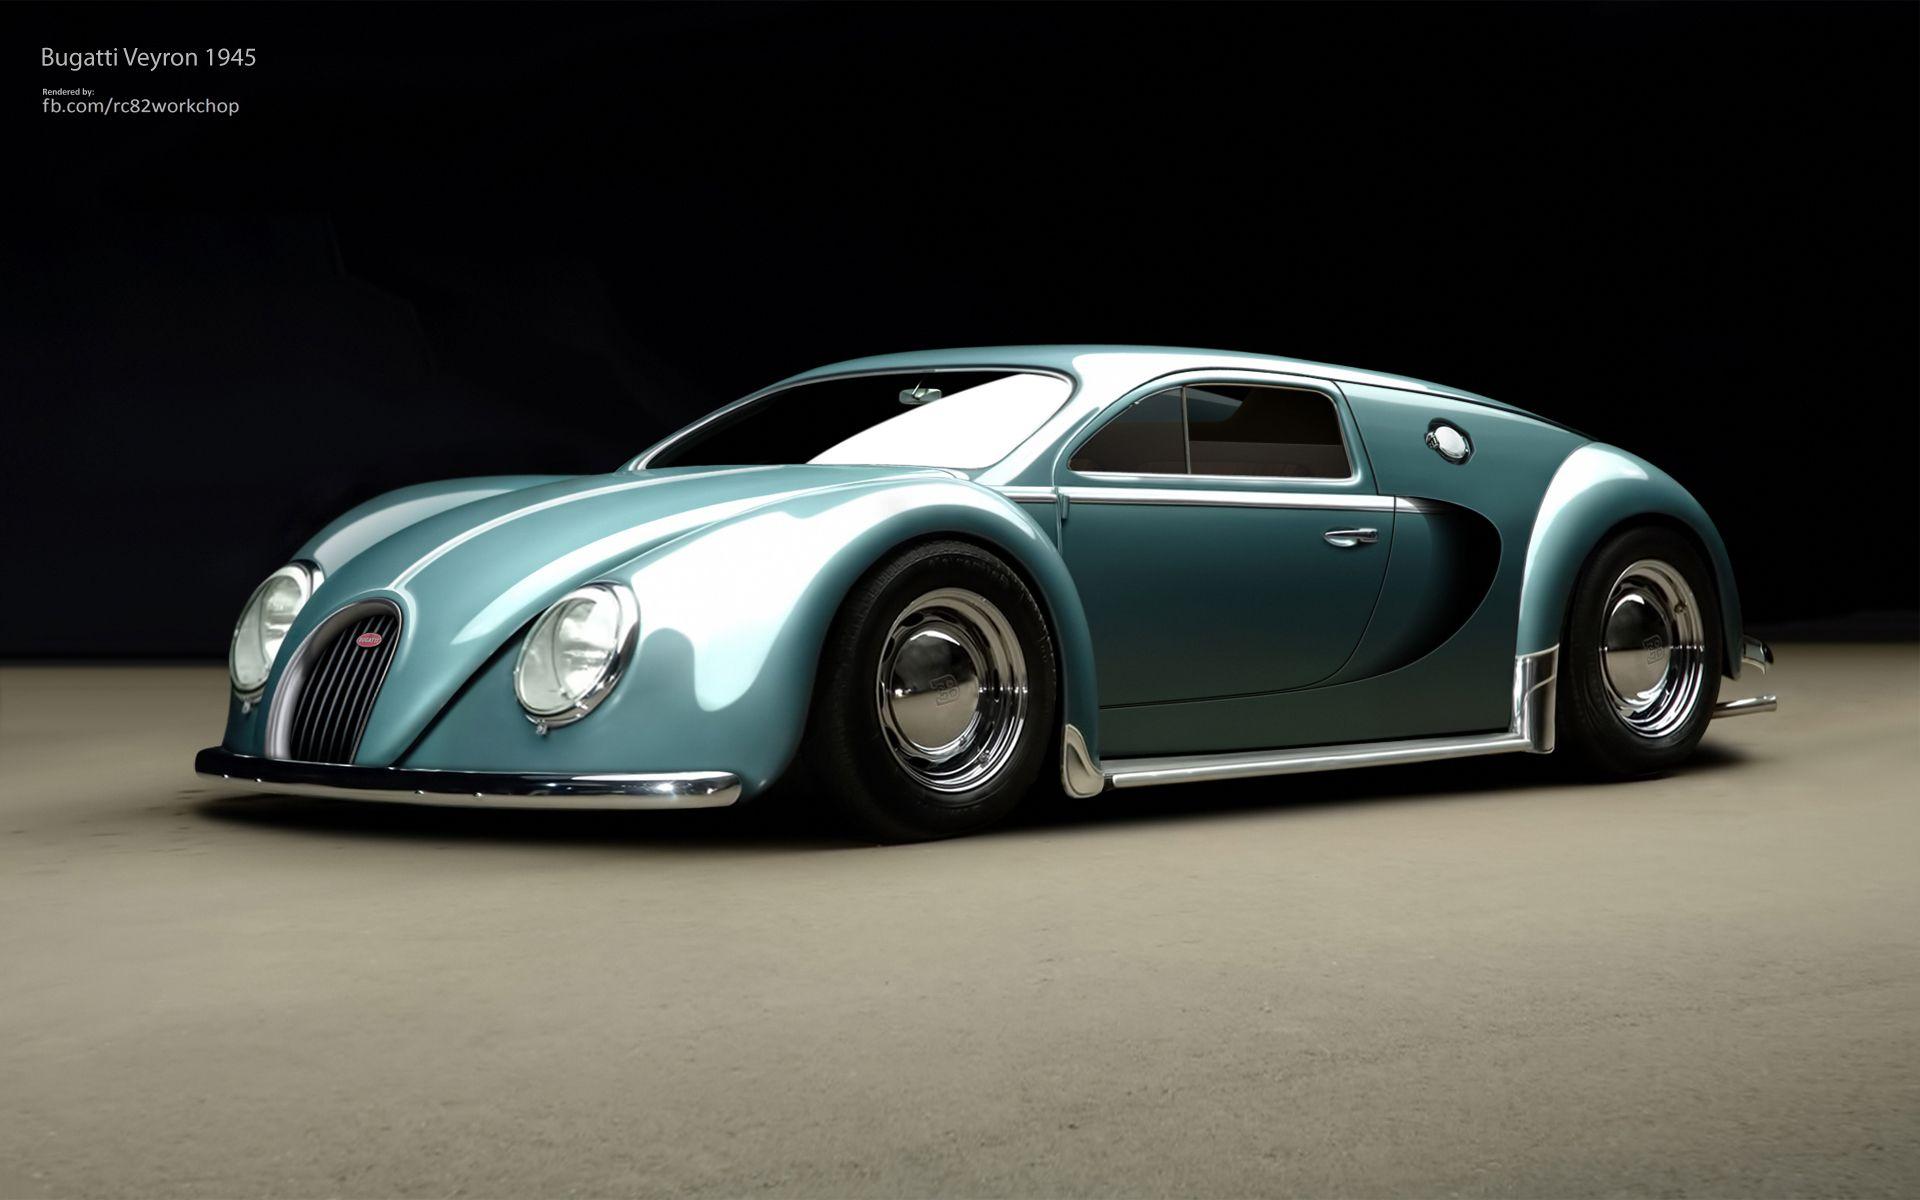 bugatti veyron 1945 wheels pinterest cars bugatti veyron and bugatti. Black Bedroom Furniture Sets. Home Design Ideas